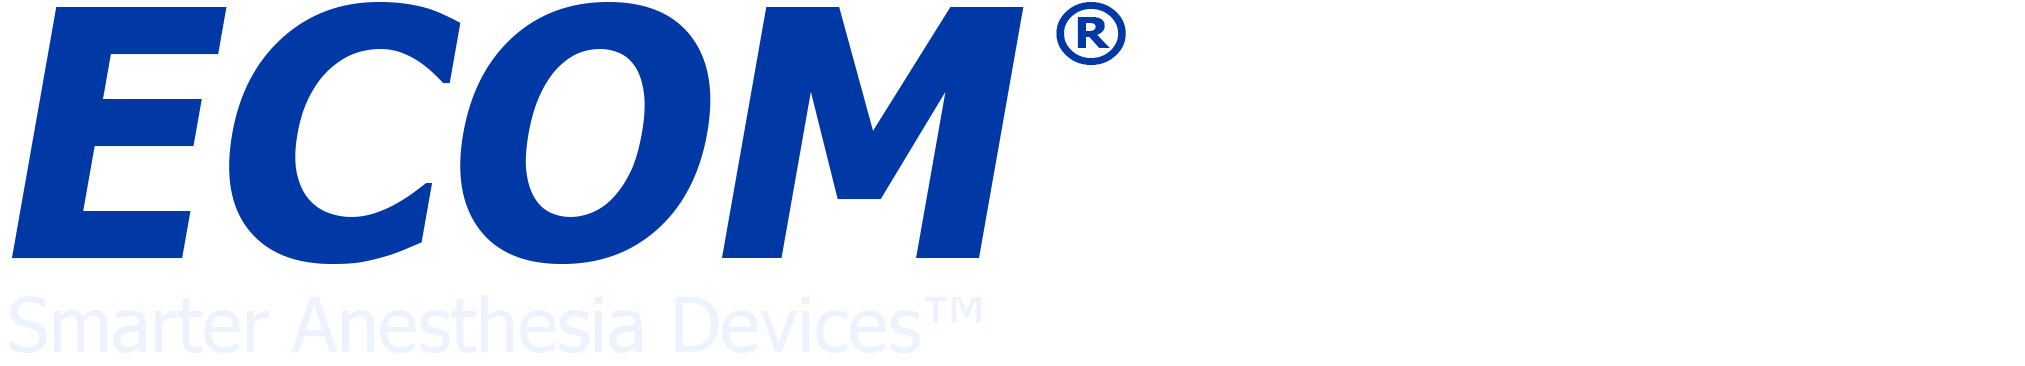 ECOM® Medical, Inc.